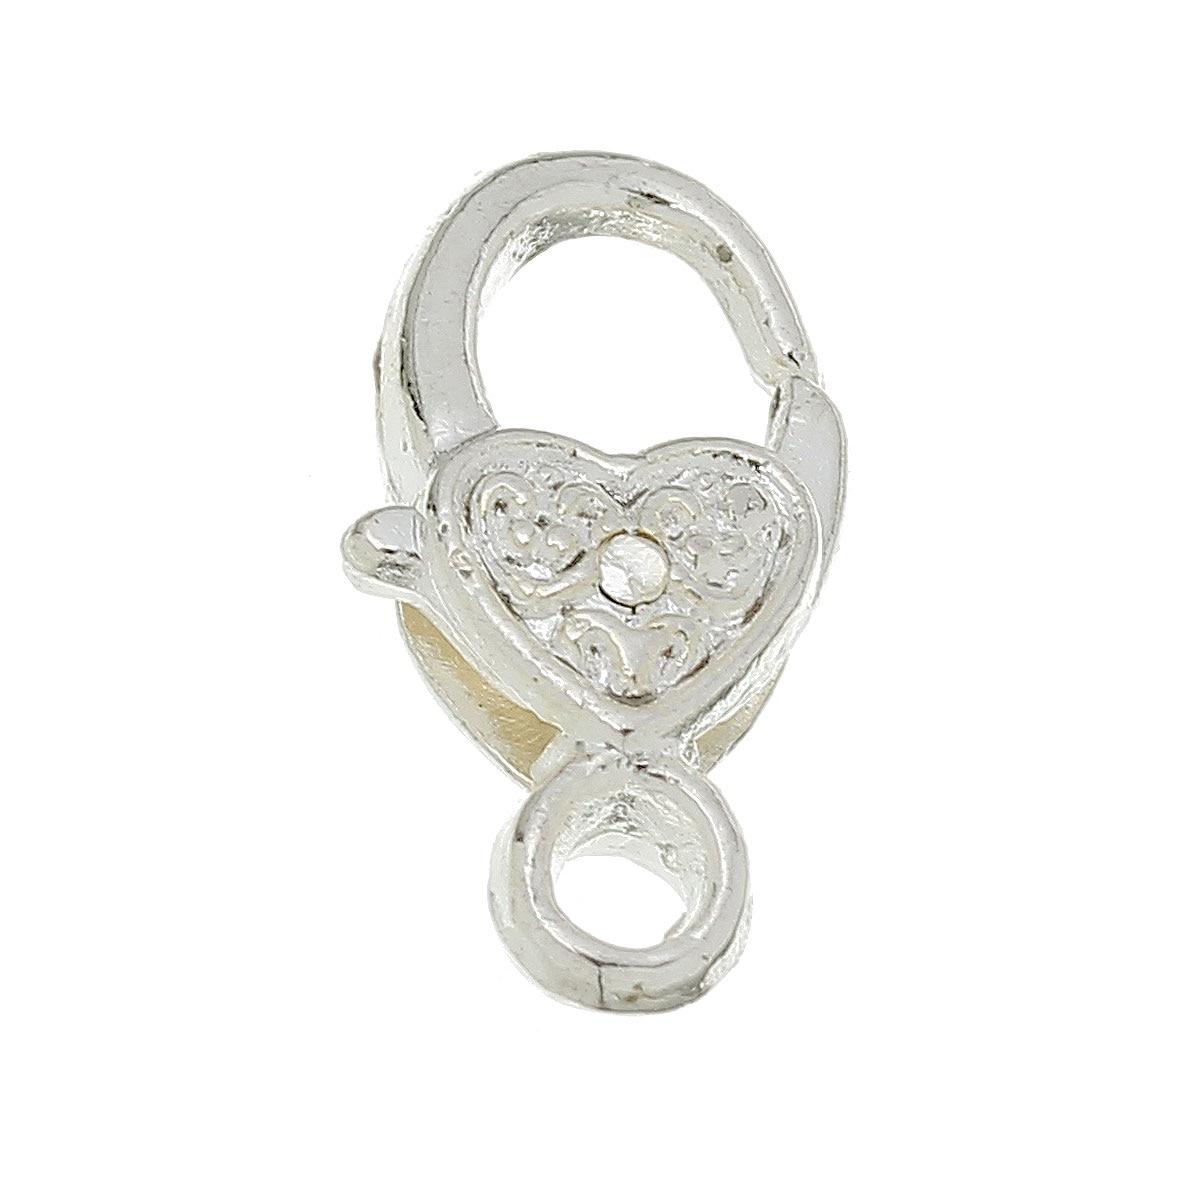 DoreenBeads Zinc Metal Alloy Lobster Clasp Findings Silver Color Heart Pattern 17mm( 5/8